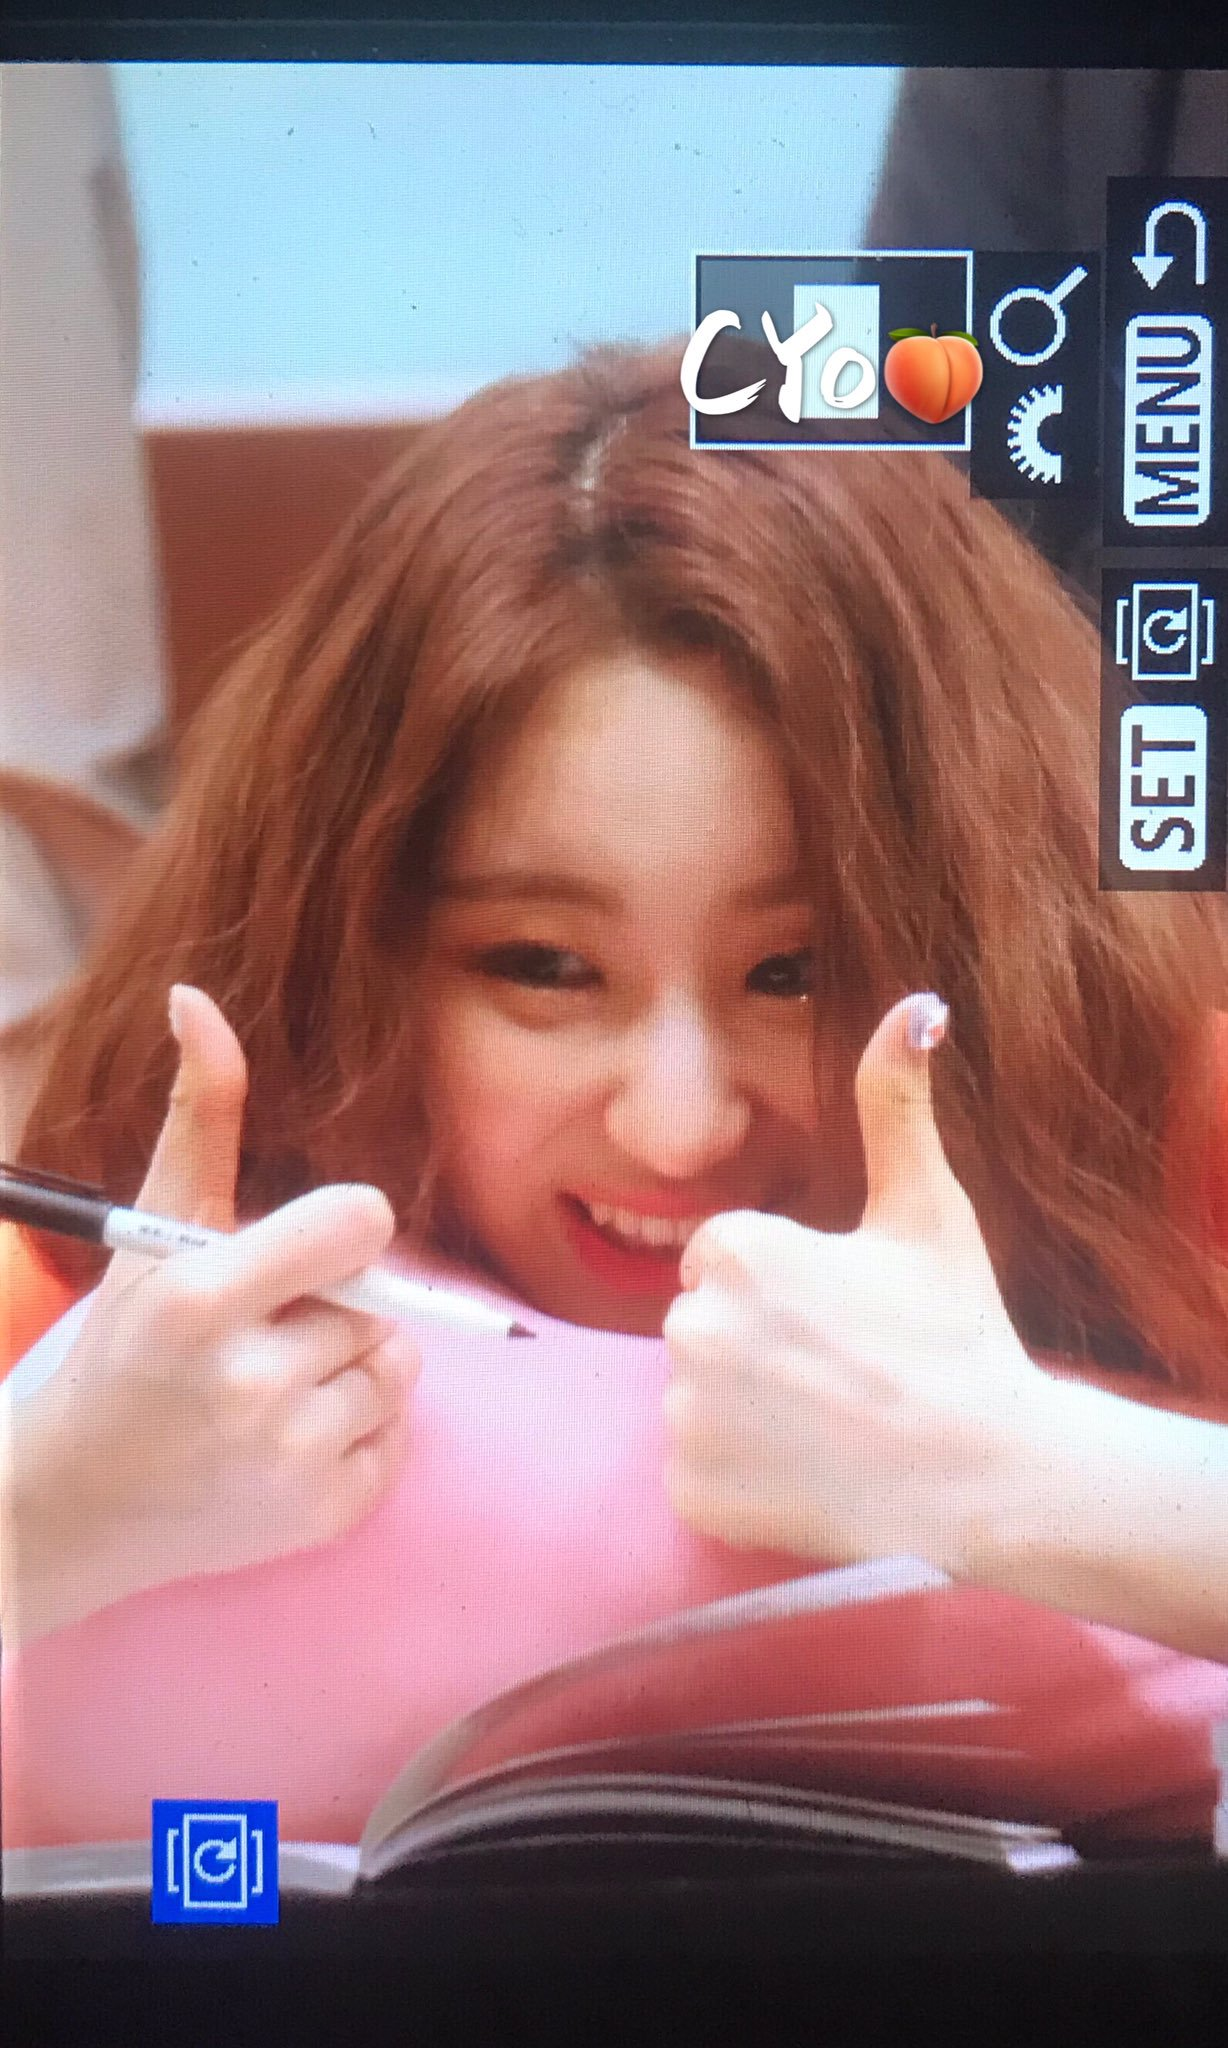 izone, izone profile, izone facts, izone height, izone weight, izone members, izone leader, izone comeback, izone violetta, izone center, izone chaeyeon, chaeyeon